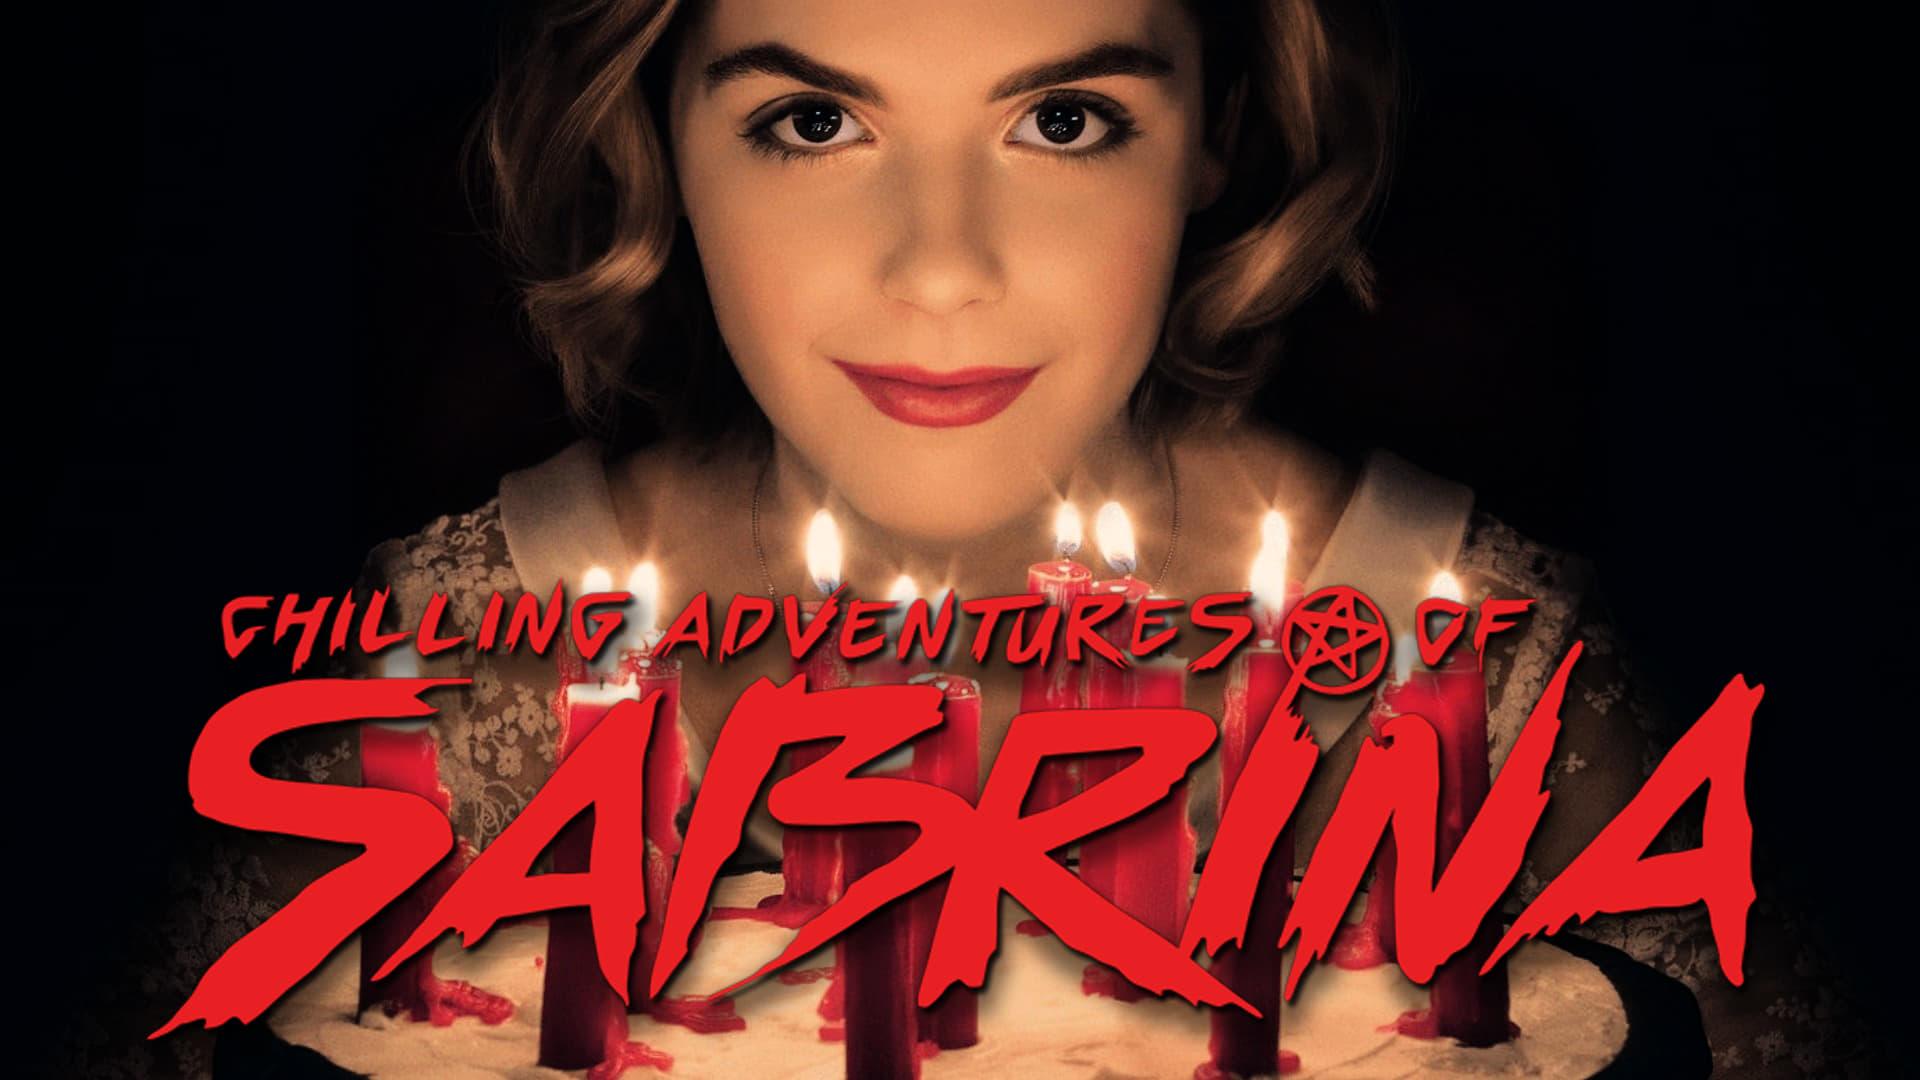 Chilling Adventures of Sabrina - Season 2 Episode 13 Chapter Thirty-Three: Deus Ex Machina